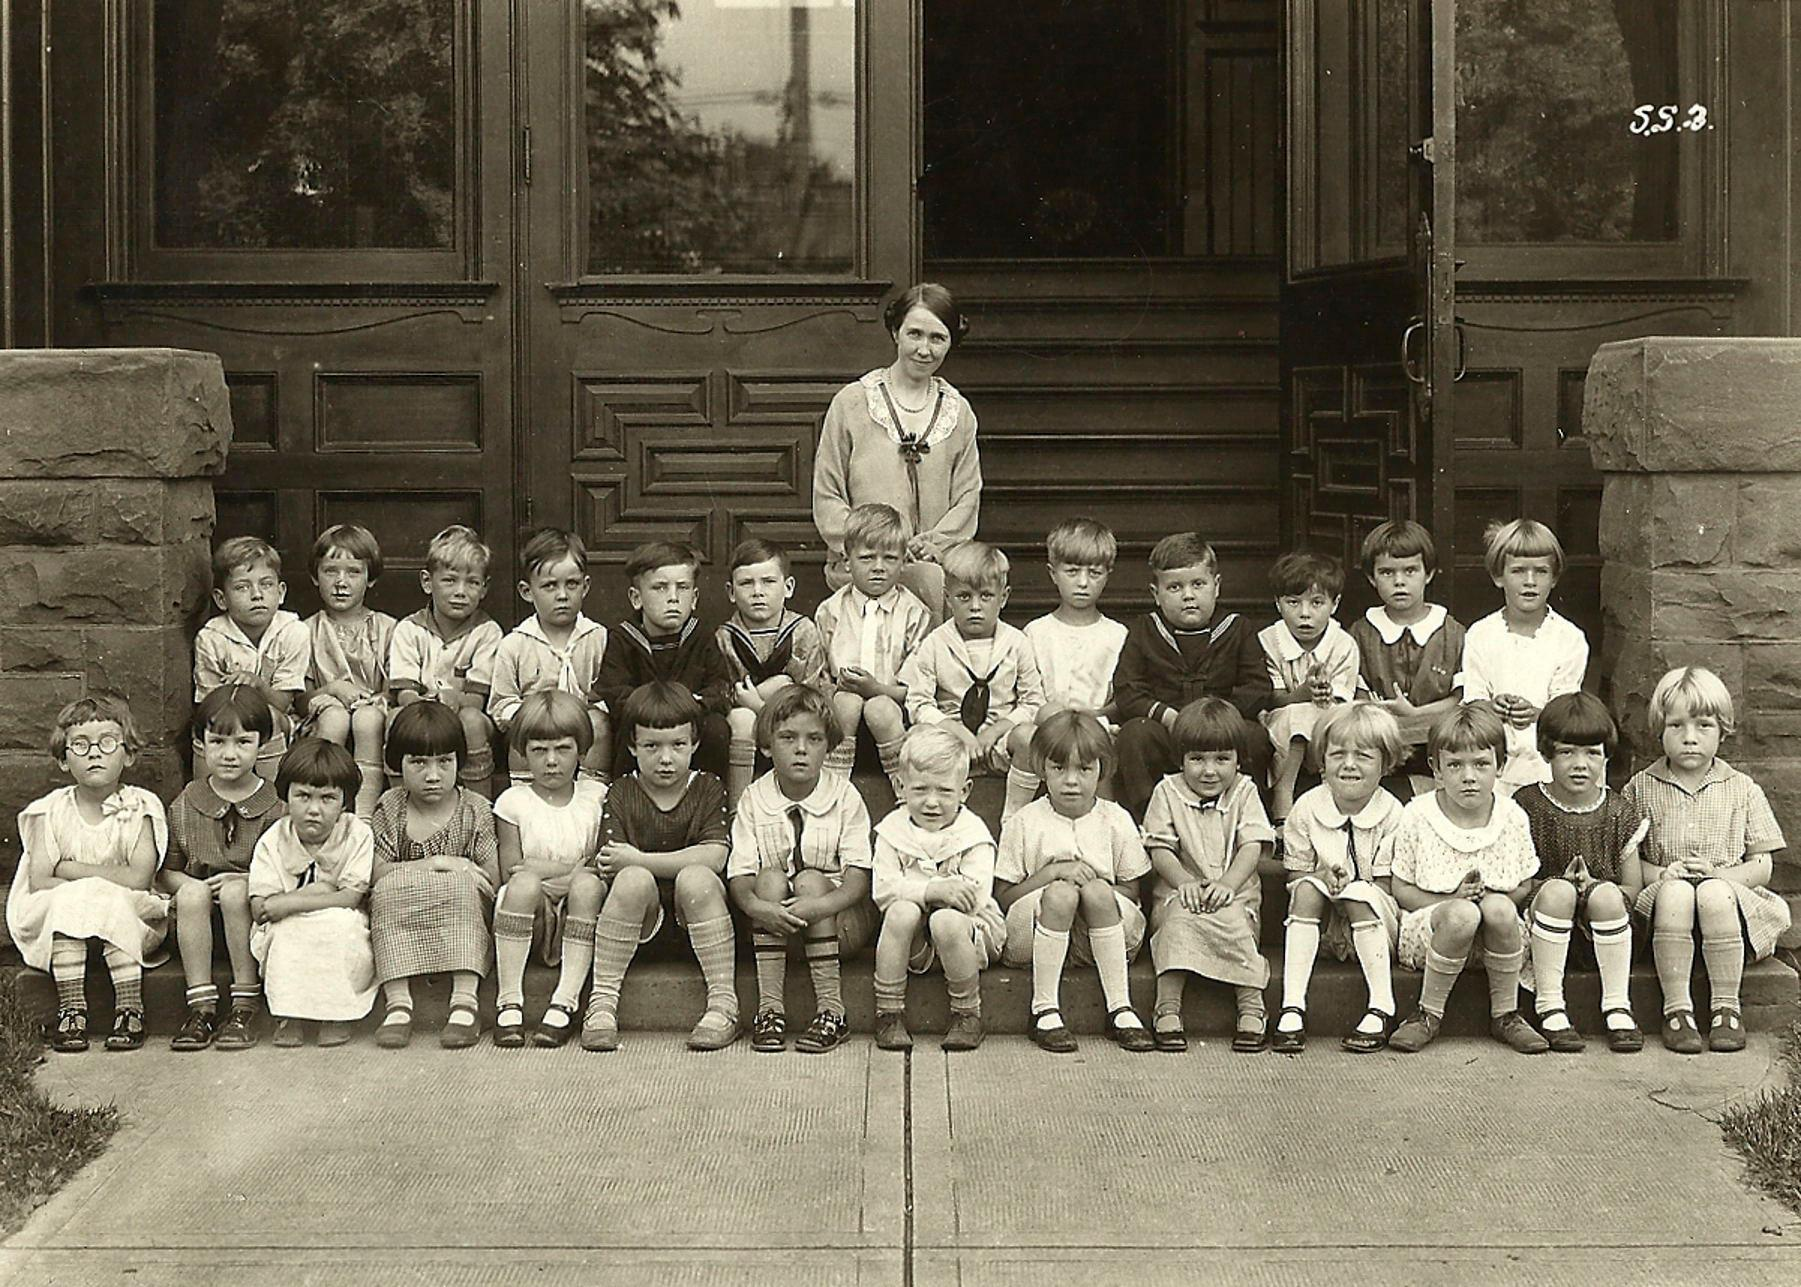 Stinon Street School - Student picture